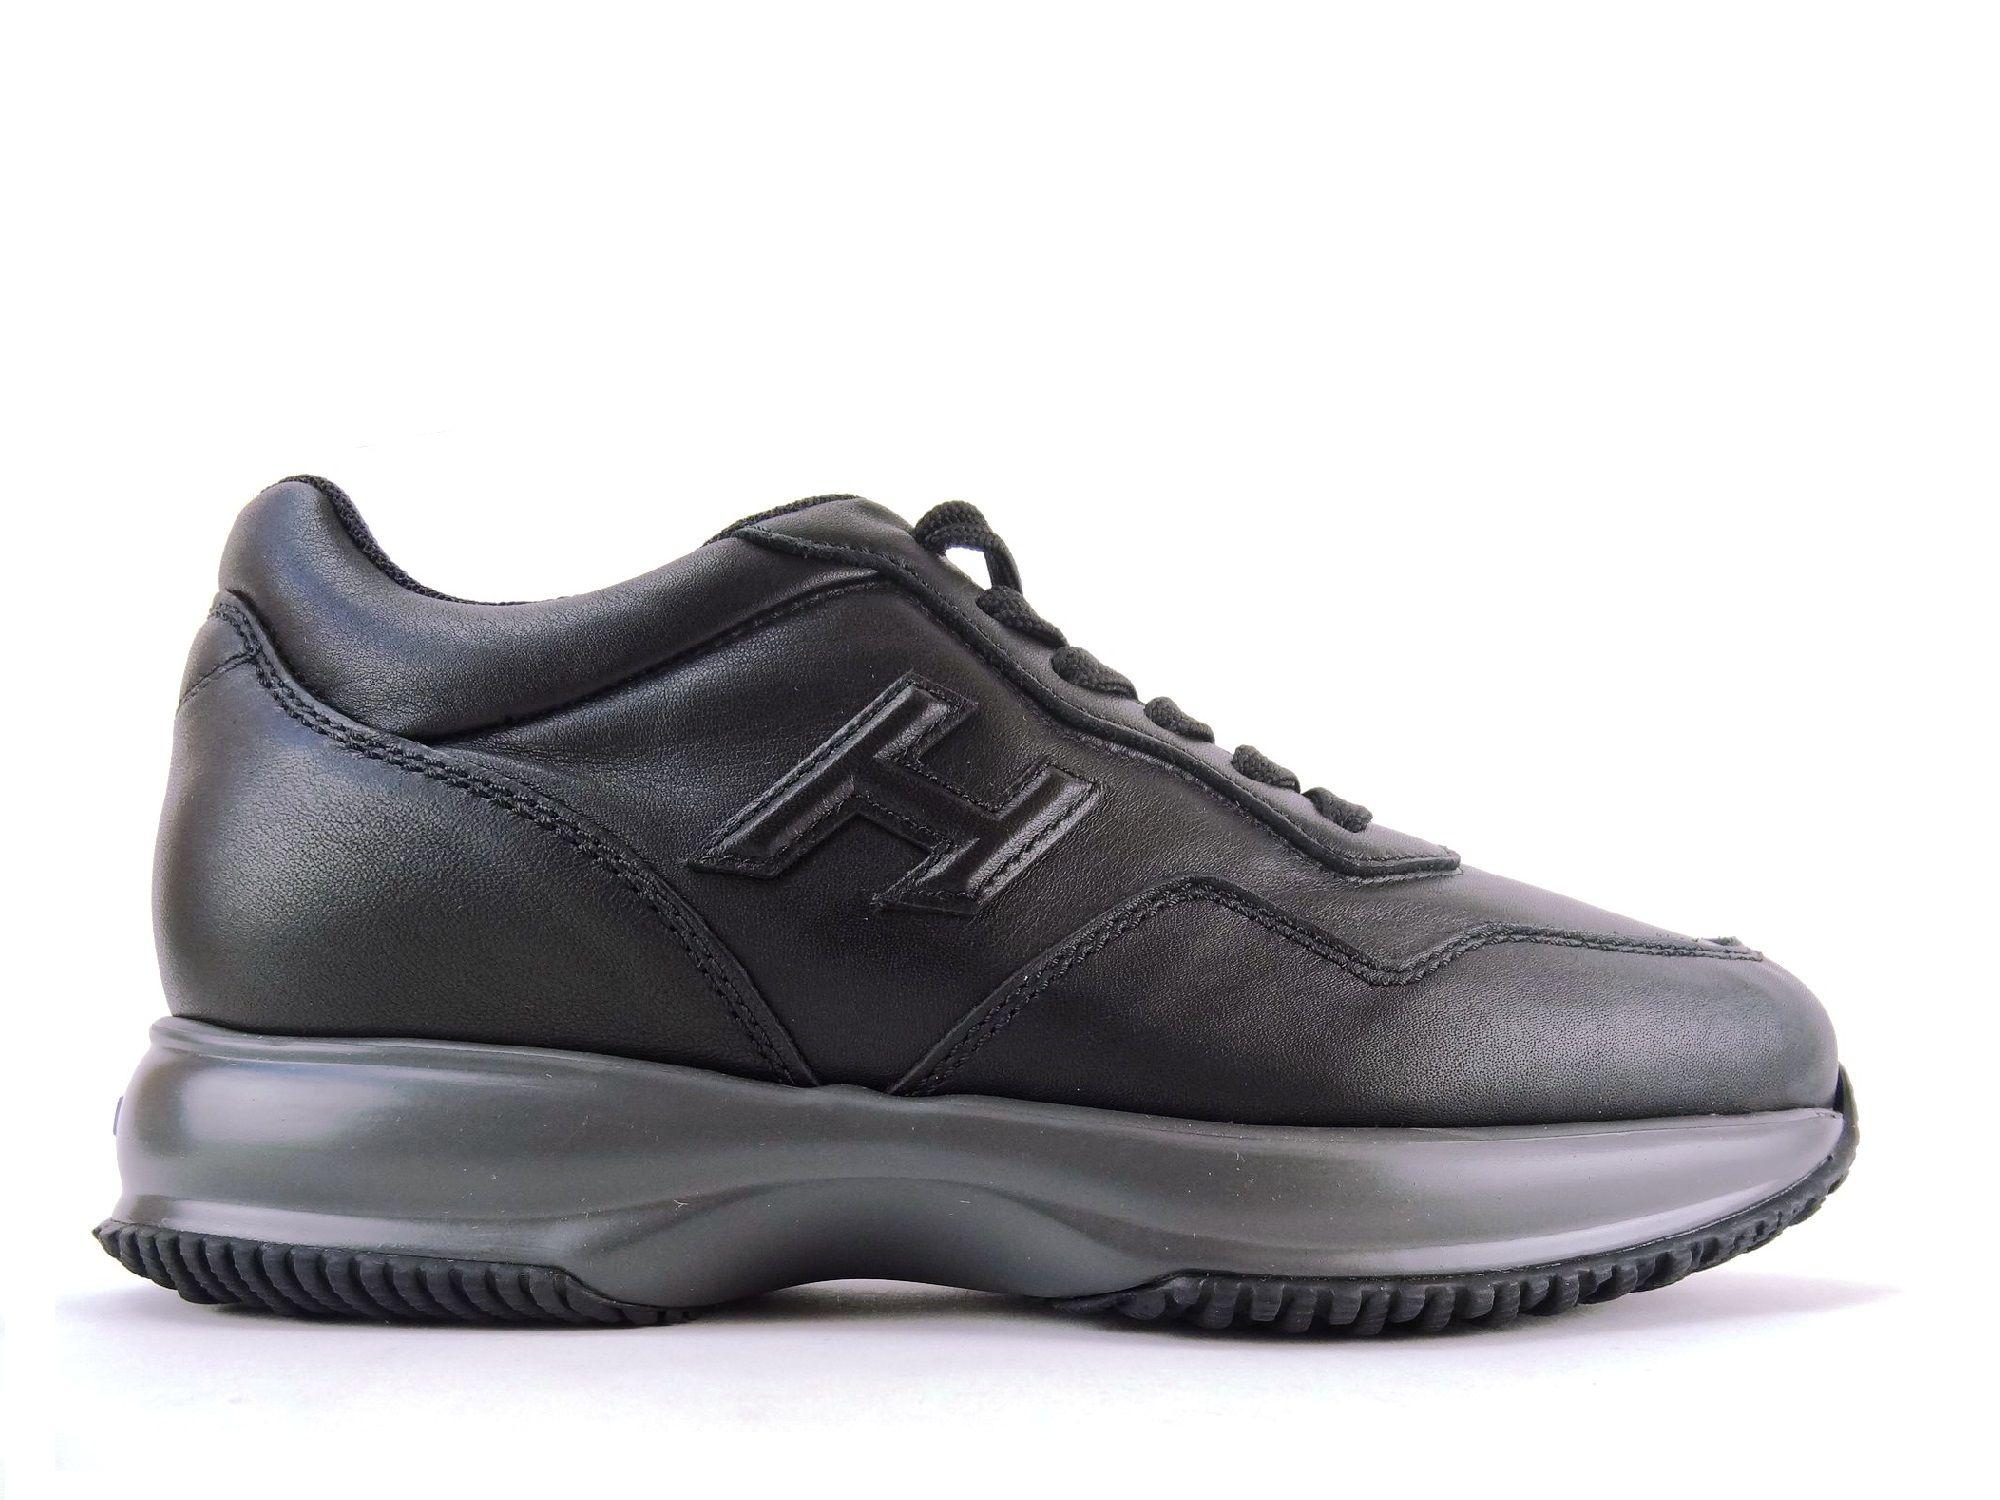 acheter populaire 06105 7abbc Sneakers Hogan - Interactive H en cuir noir | Collection P/E ...